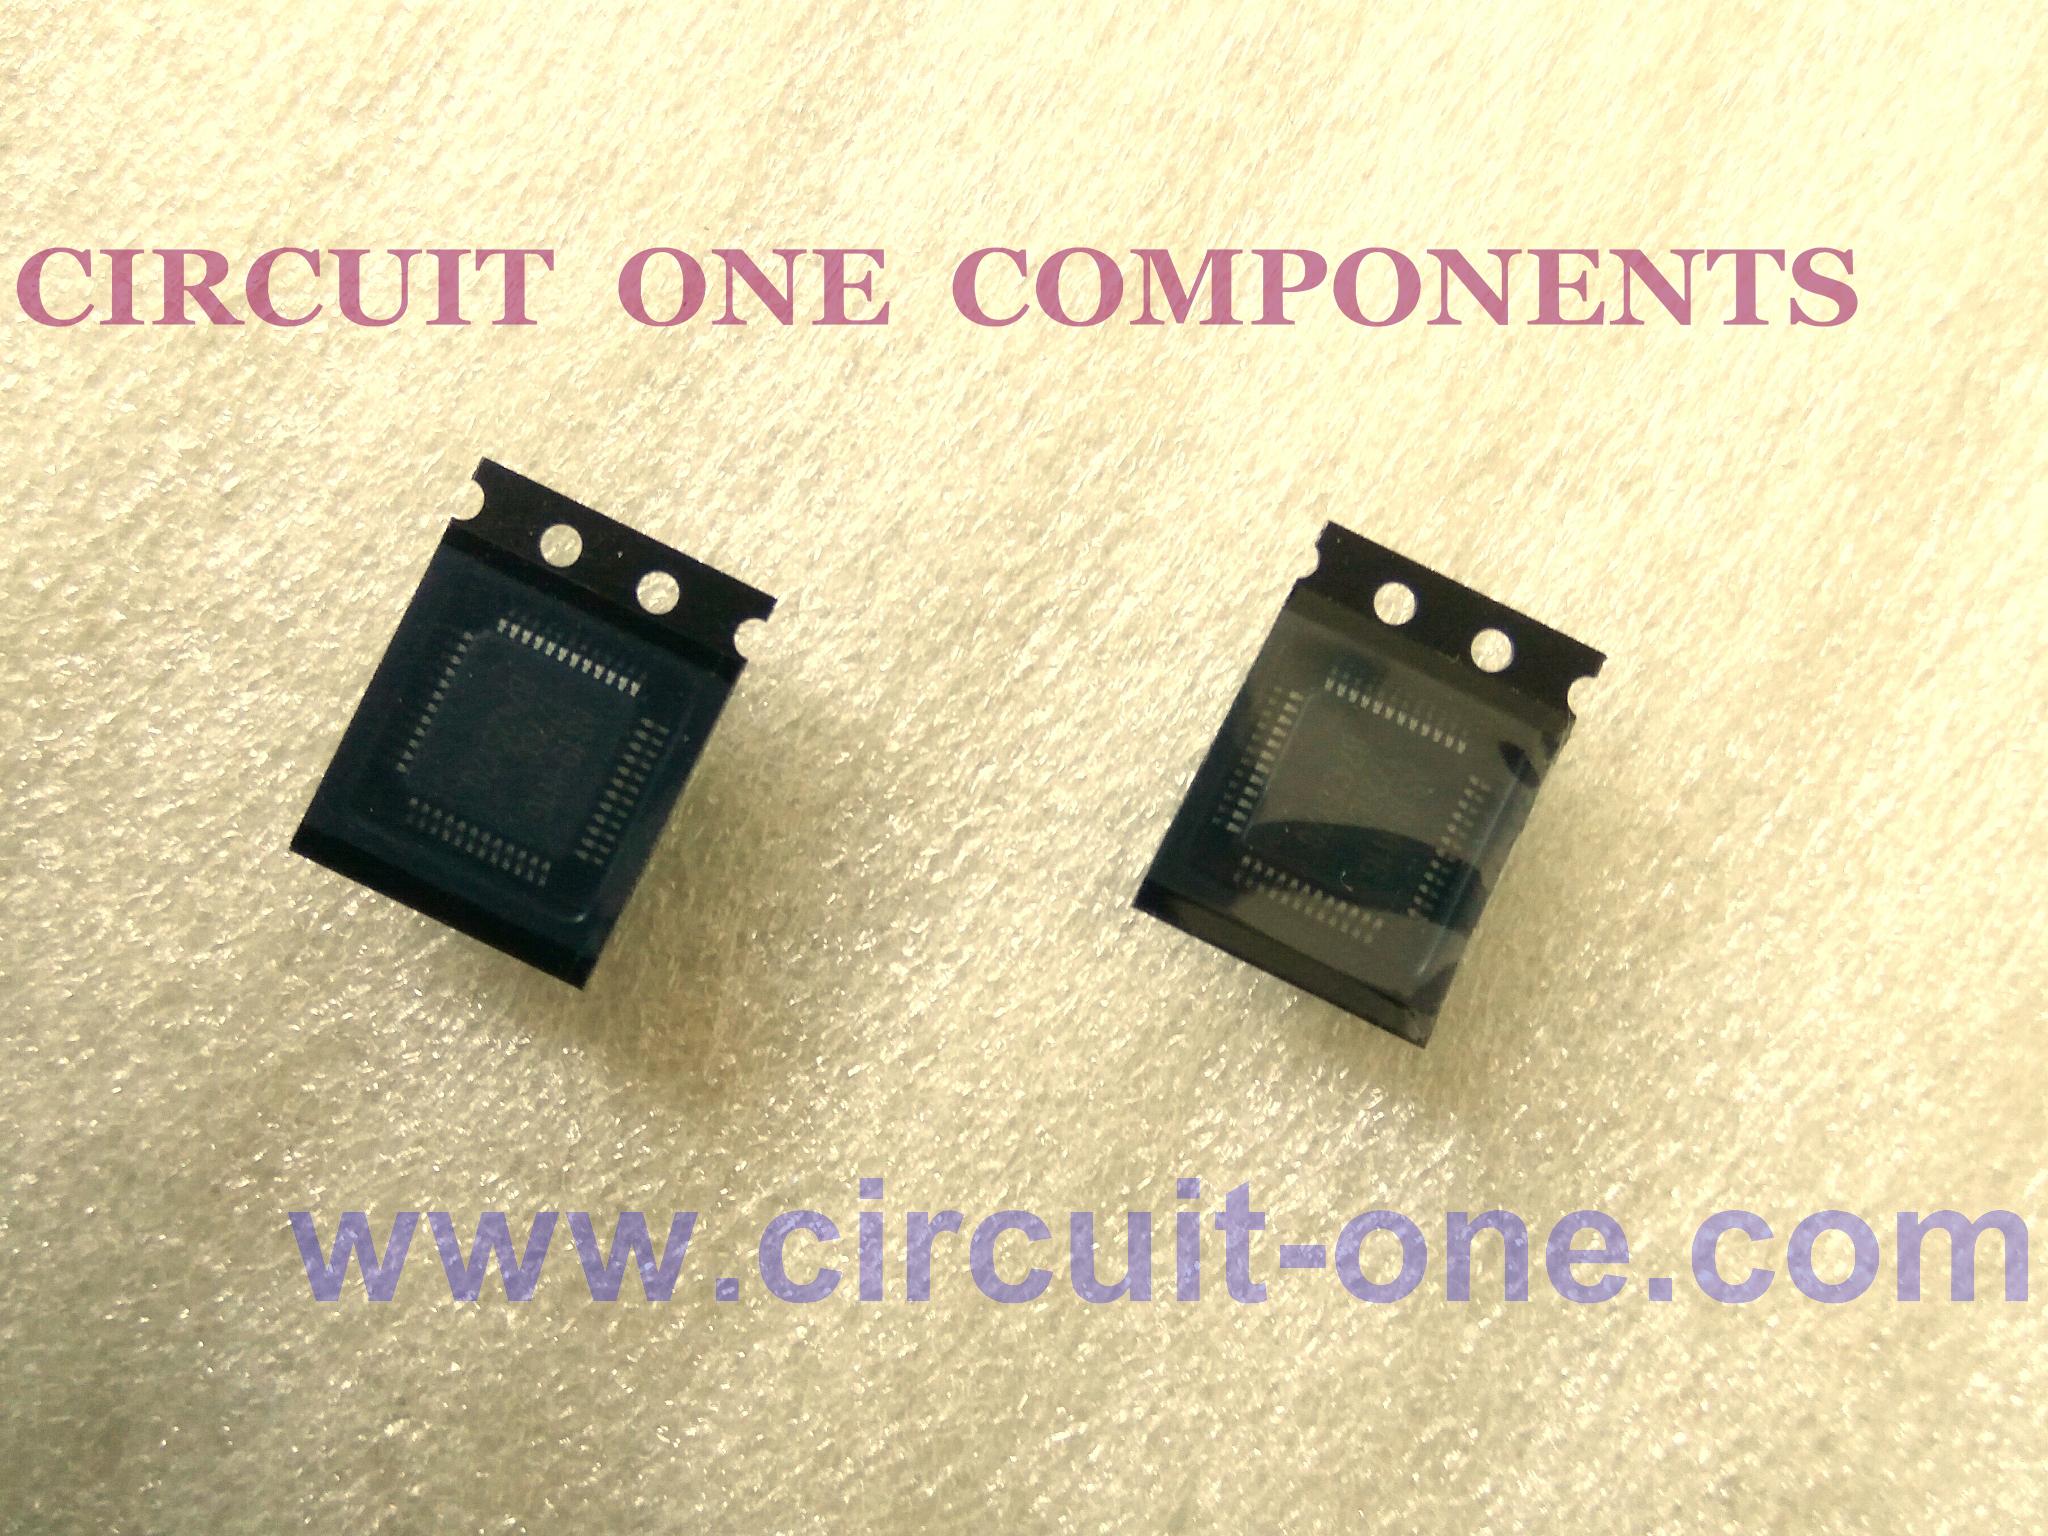 CIRCUIT ONE COMPONENTS - Pengedar Komponen Elektronik